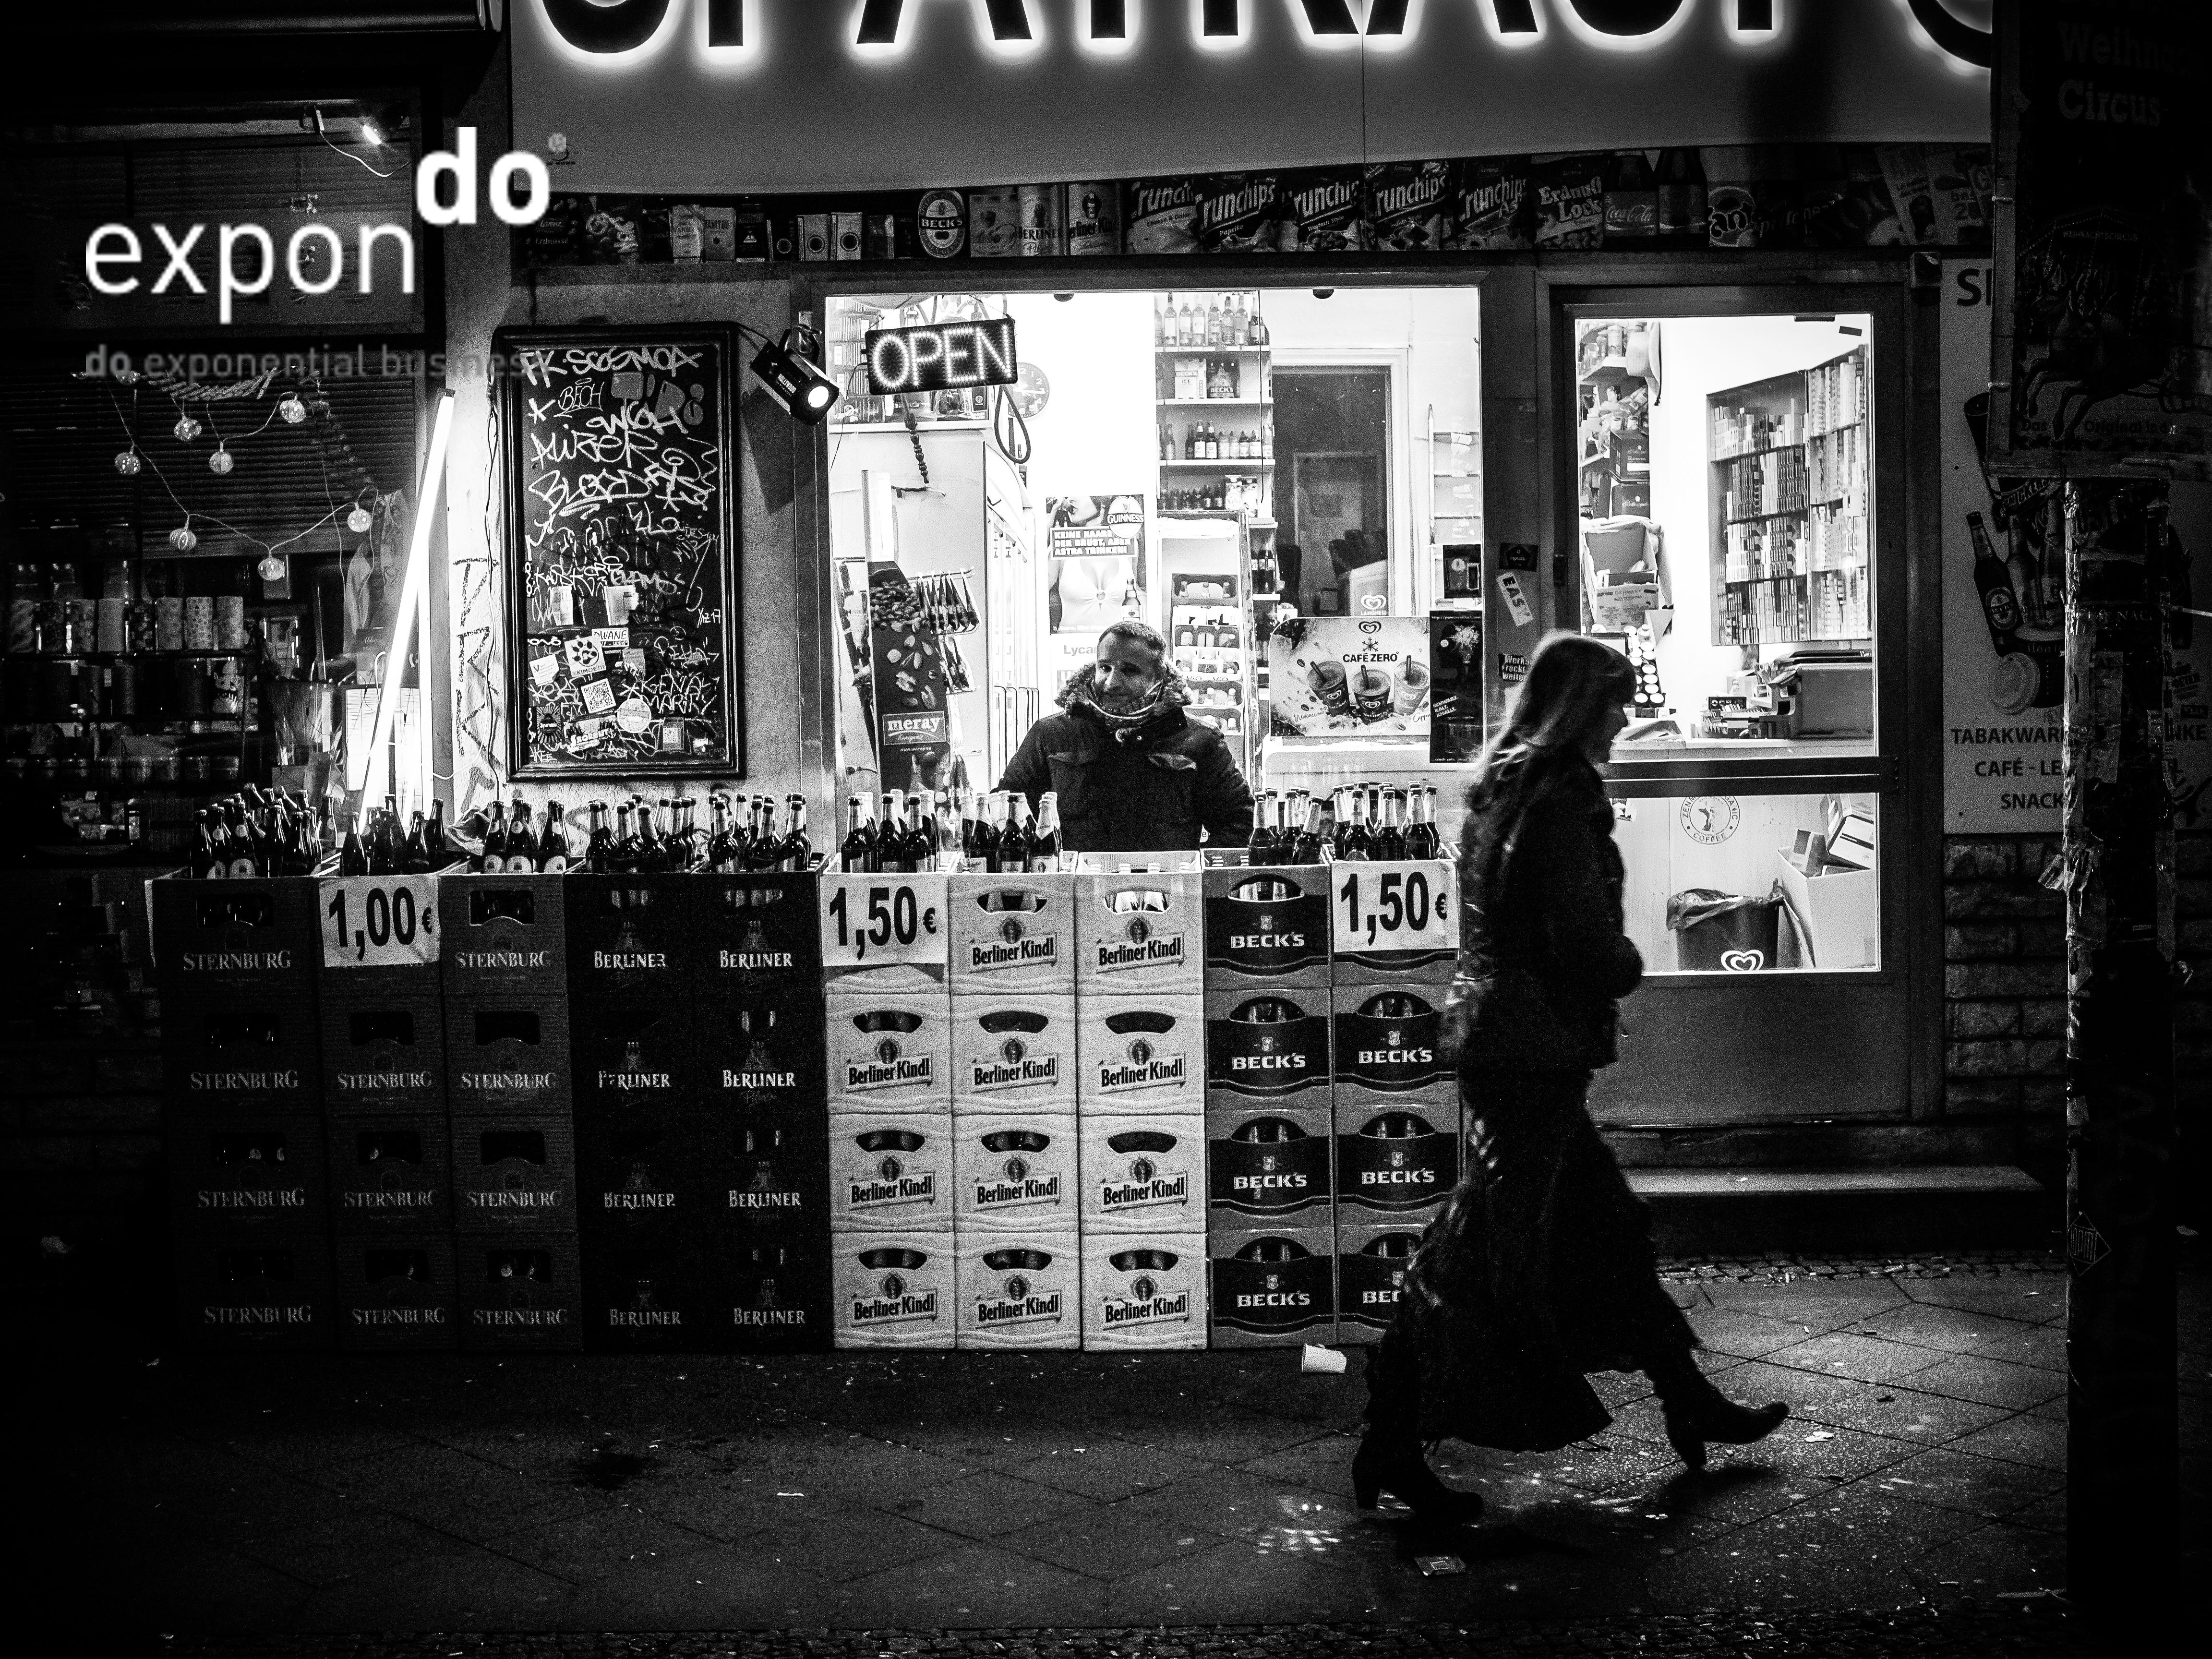 Späti Bierverkauf auf Straße